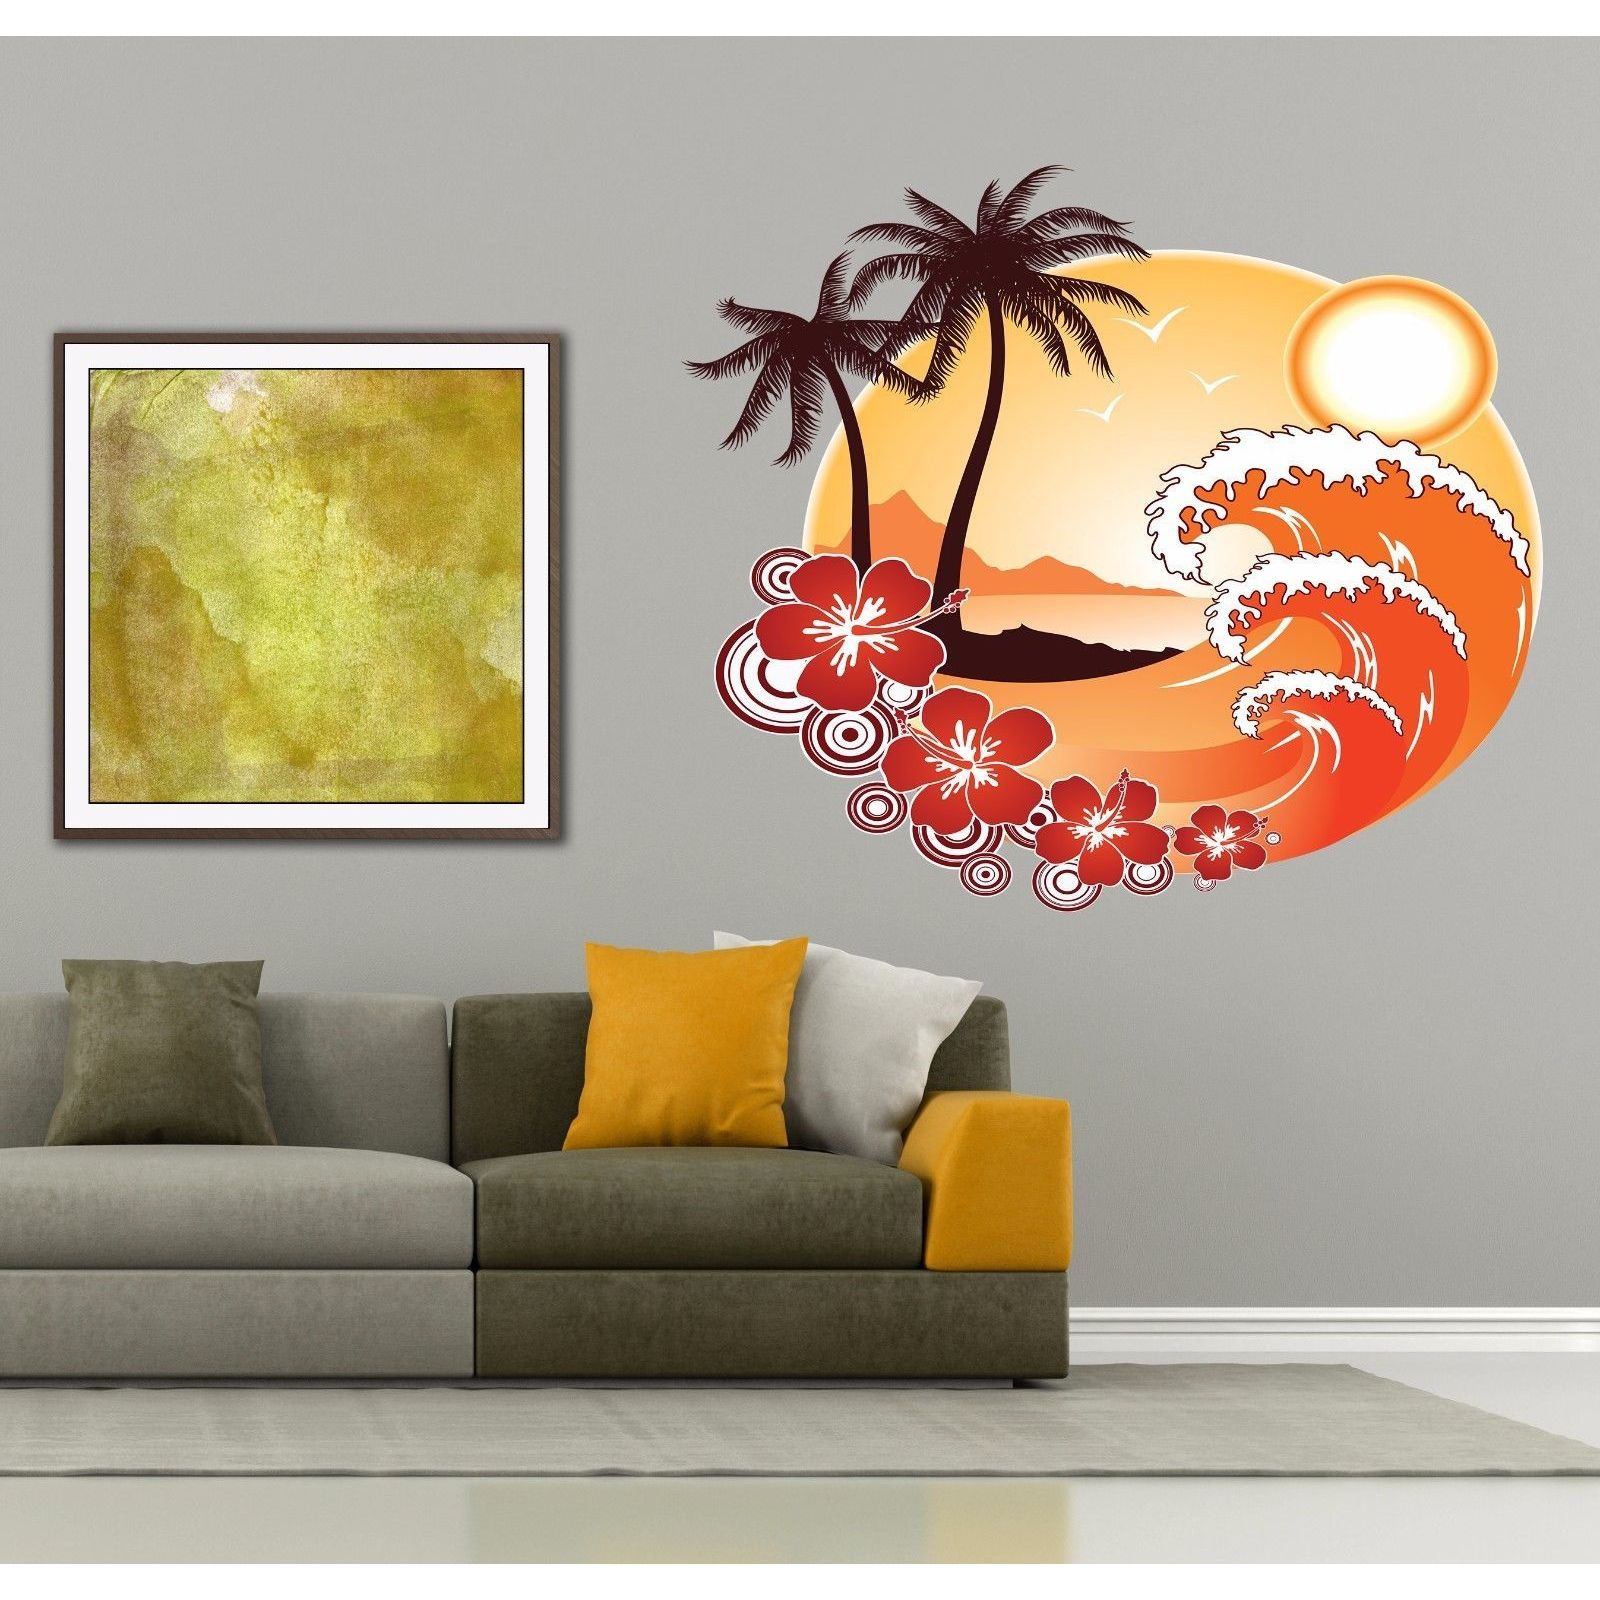 Shop Full Color Decal Beach Sun Ocean Sticker Beach Sun Decal Wall